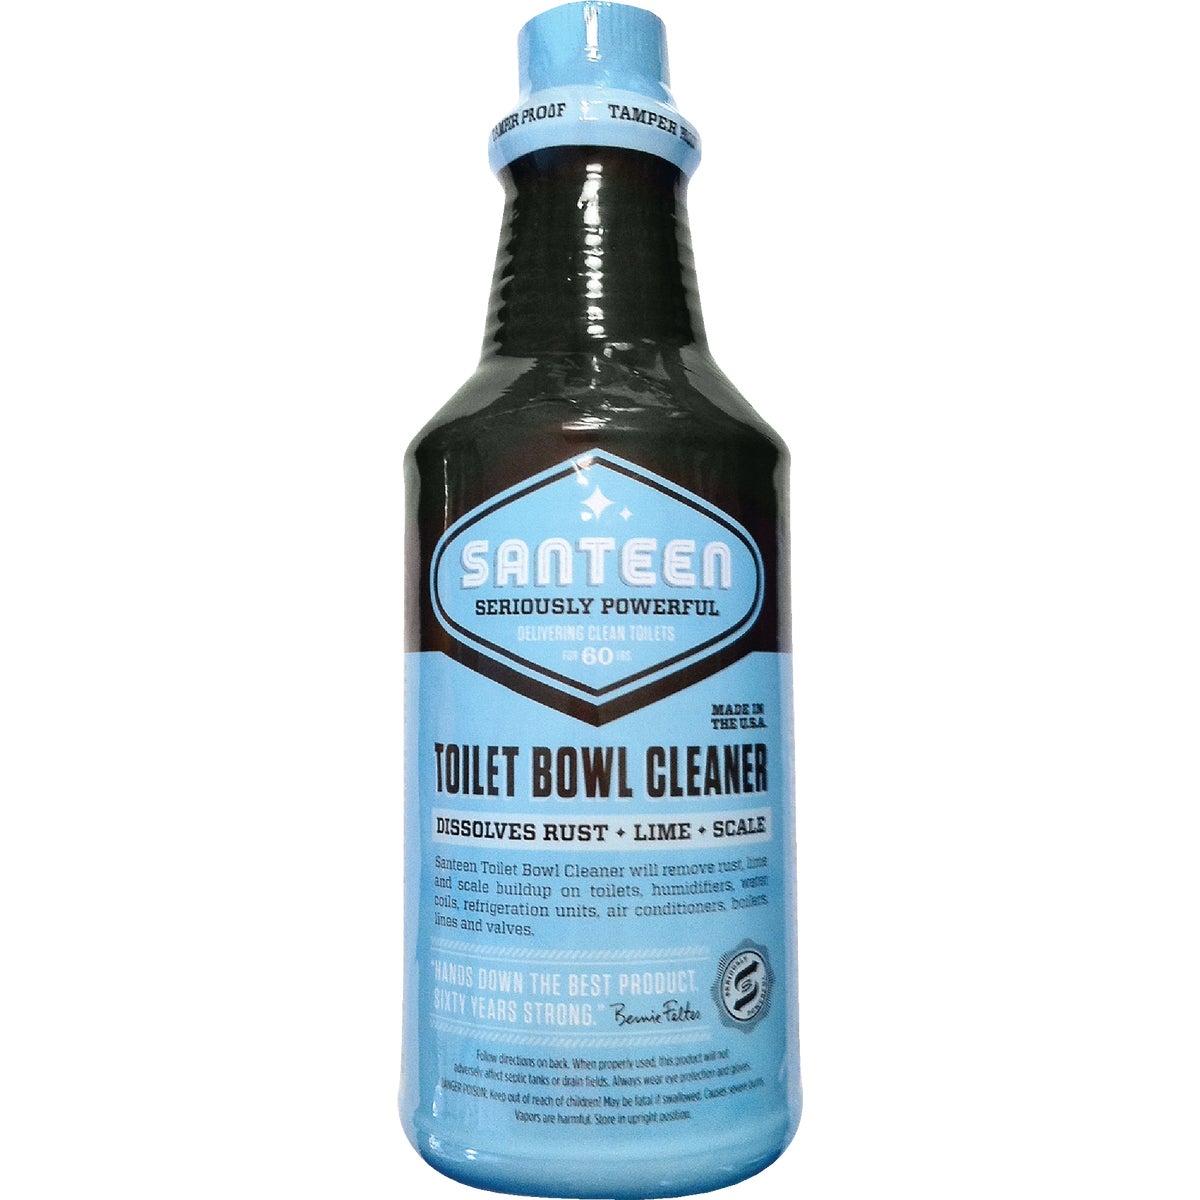 Qt Toilet Bowl Cleaner